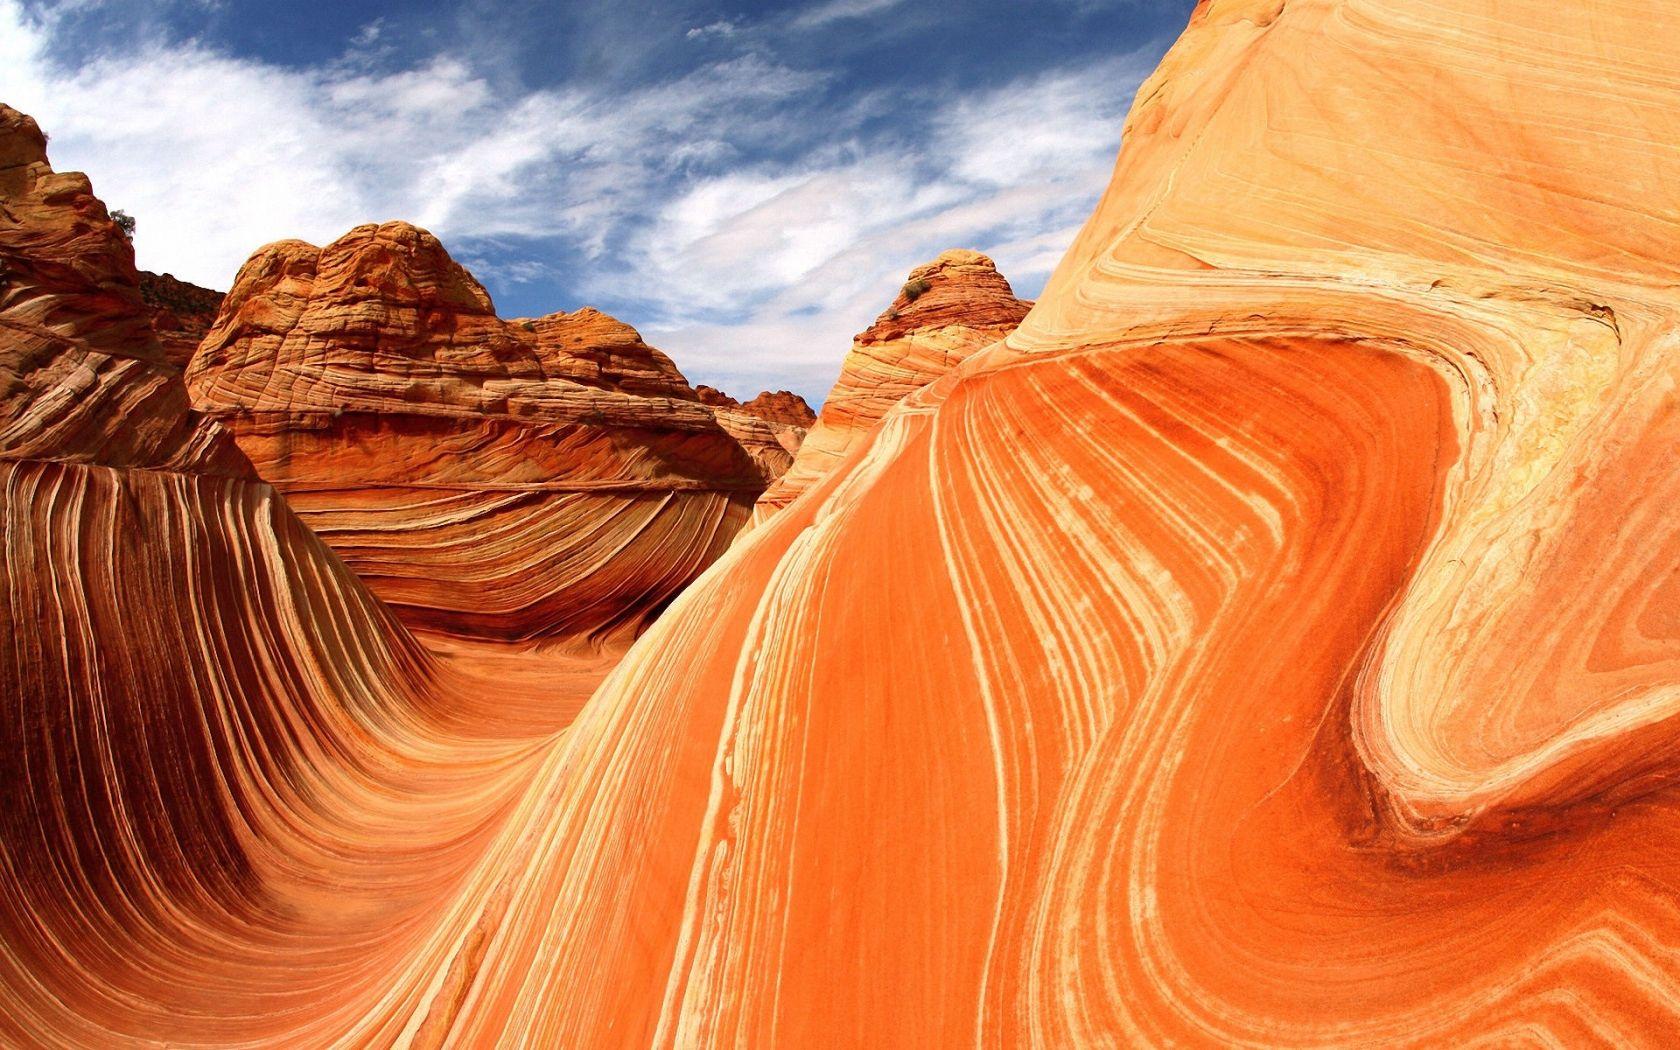 Must see Wallpaper Mac Grand Canyon - 209b9fac8b6906315d700ca77cdc4f9a  2018_25485.jpg